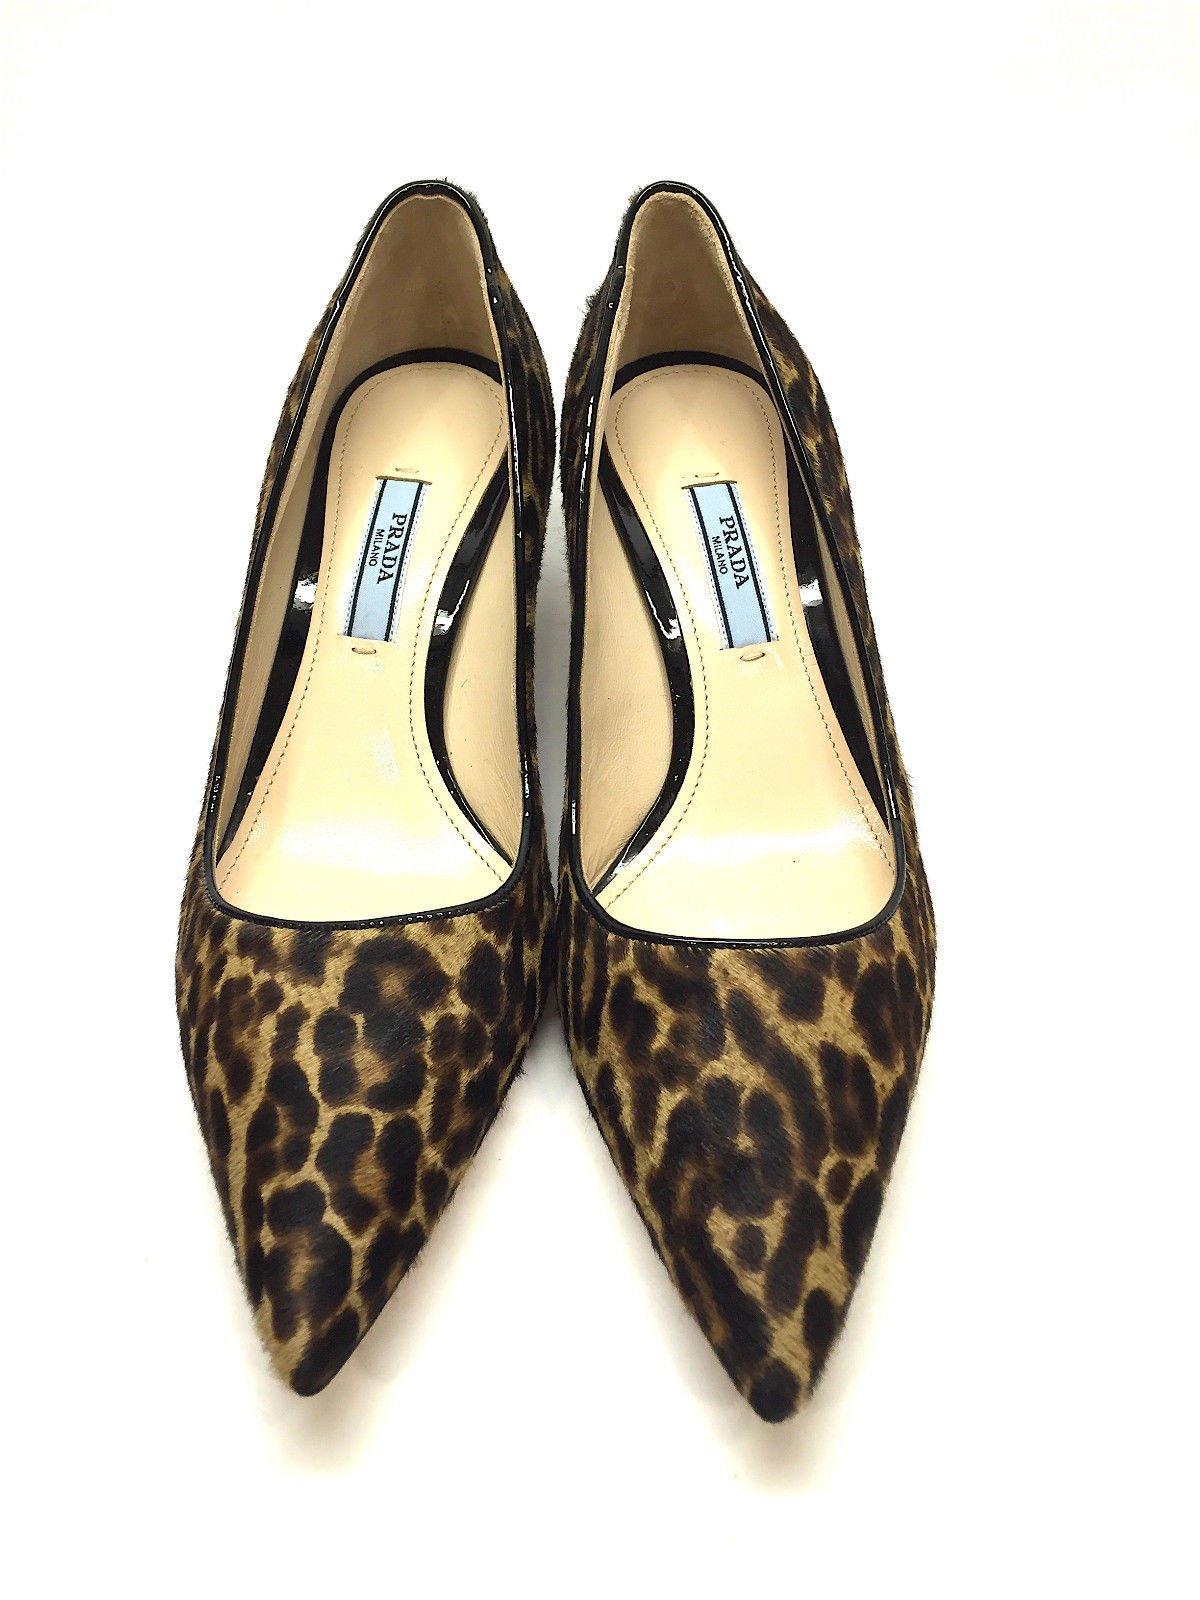 Prada Brown Tan Animal Print Calf Hair Pointed Toe Kitten Heel Pumps Shoes Size 6 5 Kitten Heel Pumps Kitten Heels Pump Shoes